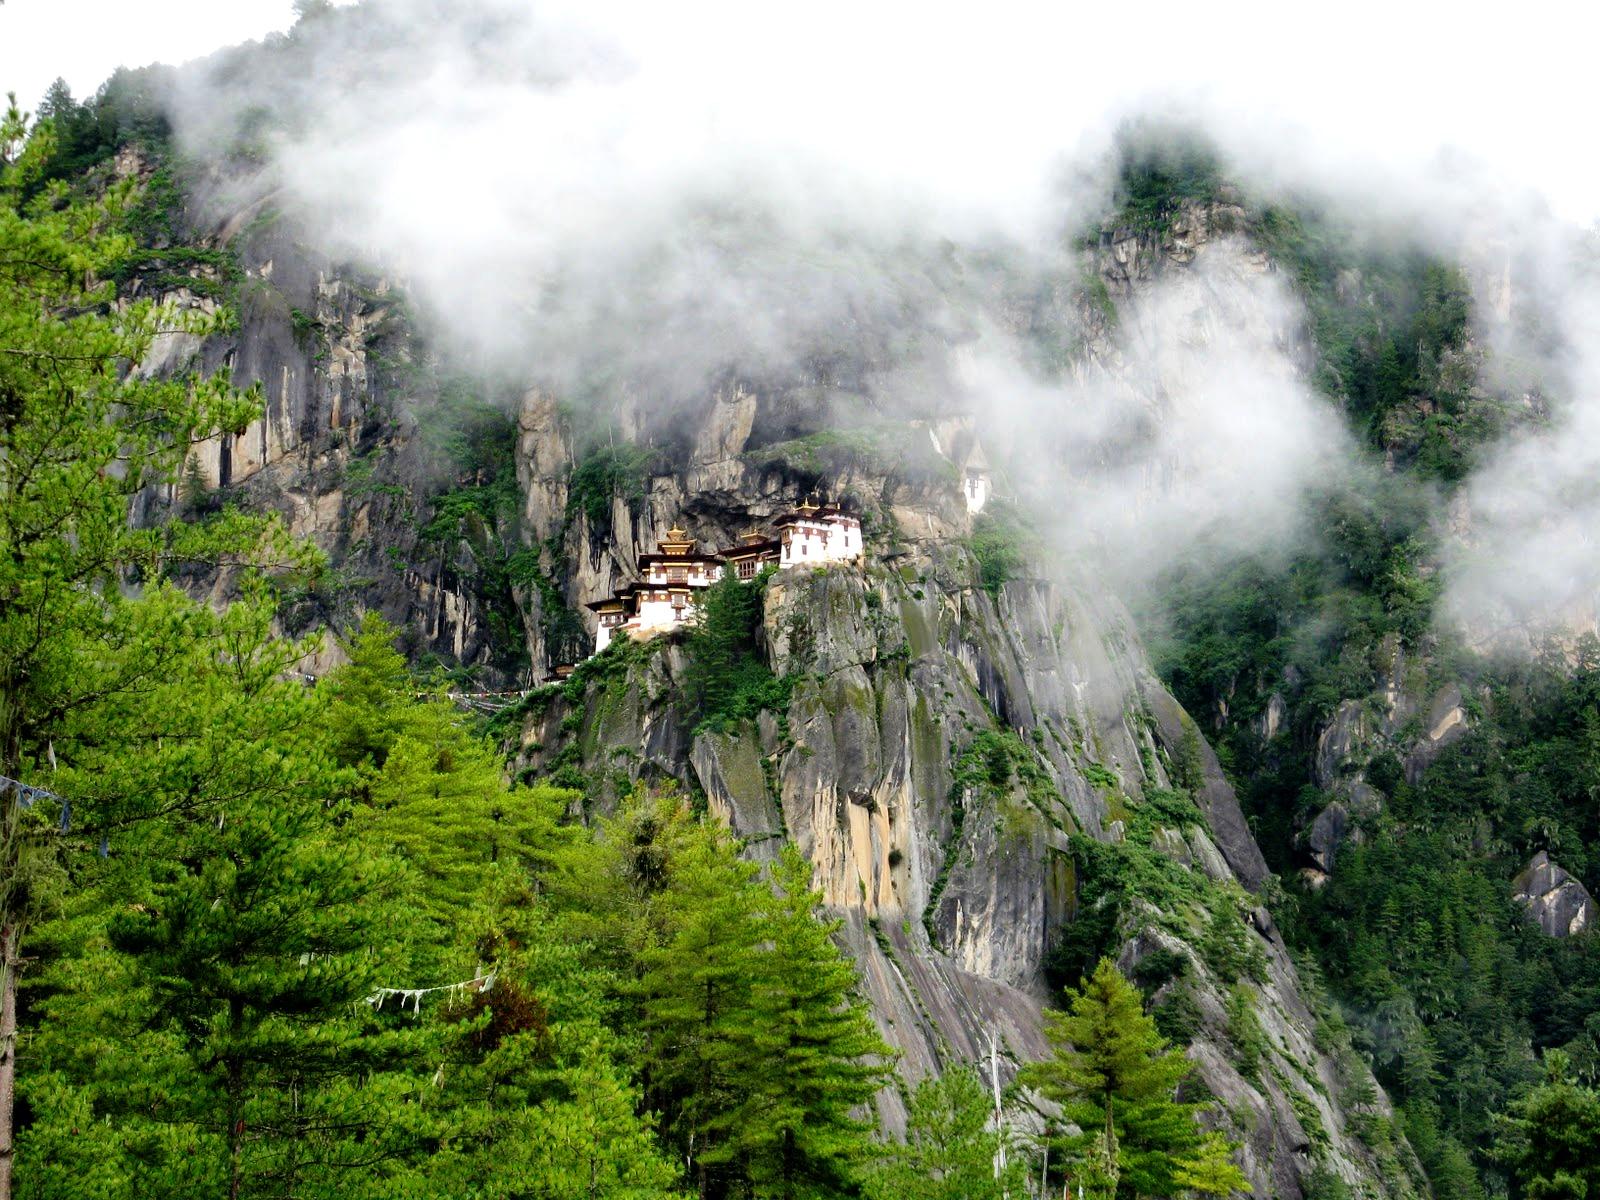 монастырь такцанг в облаках